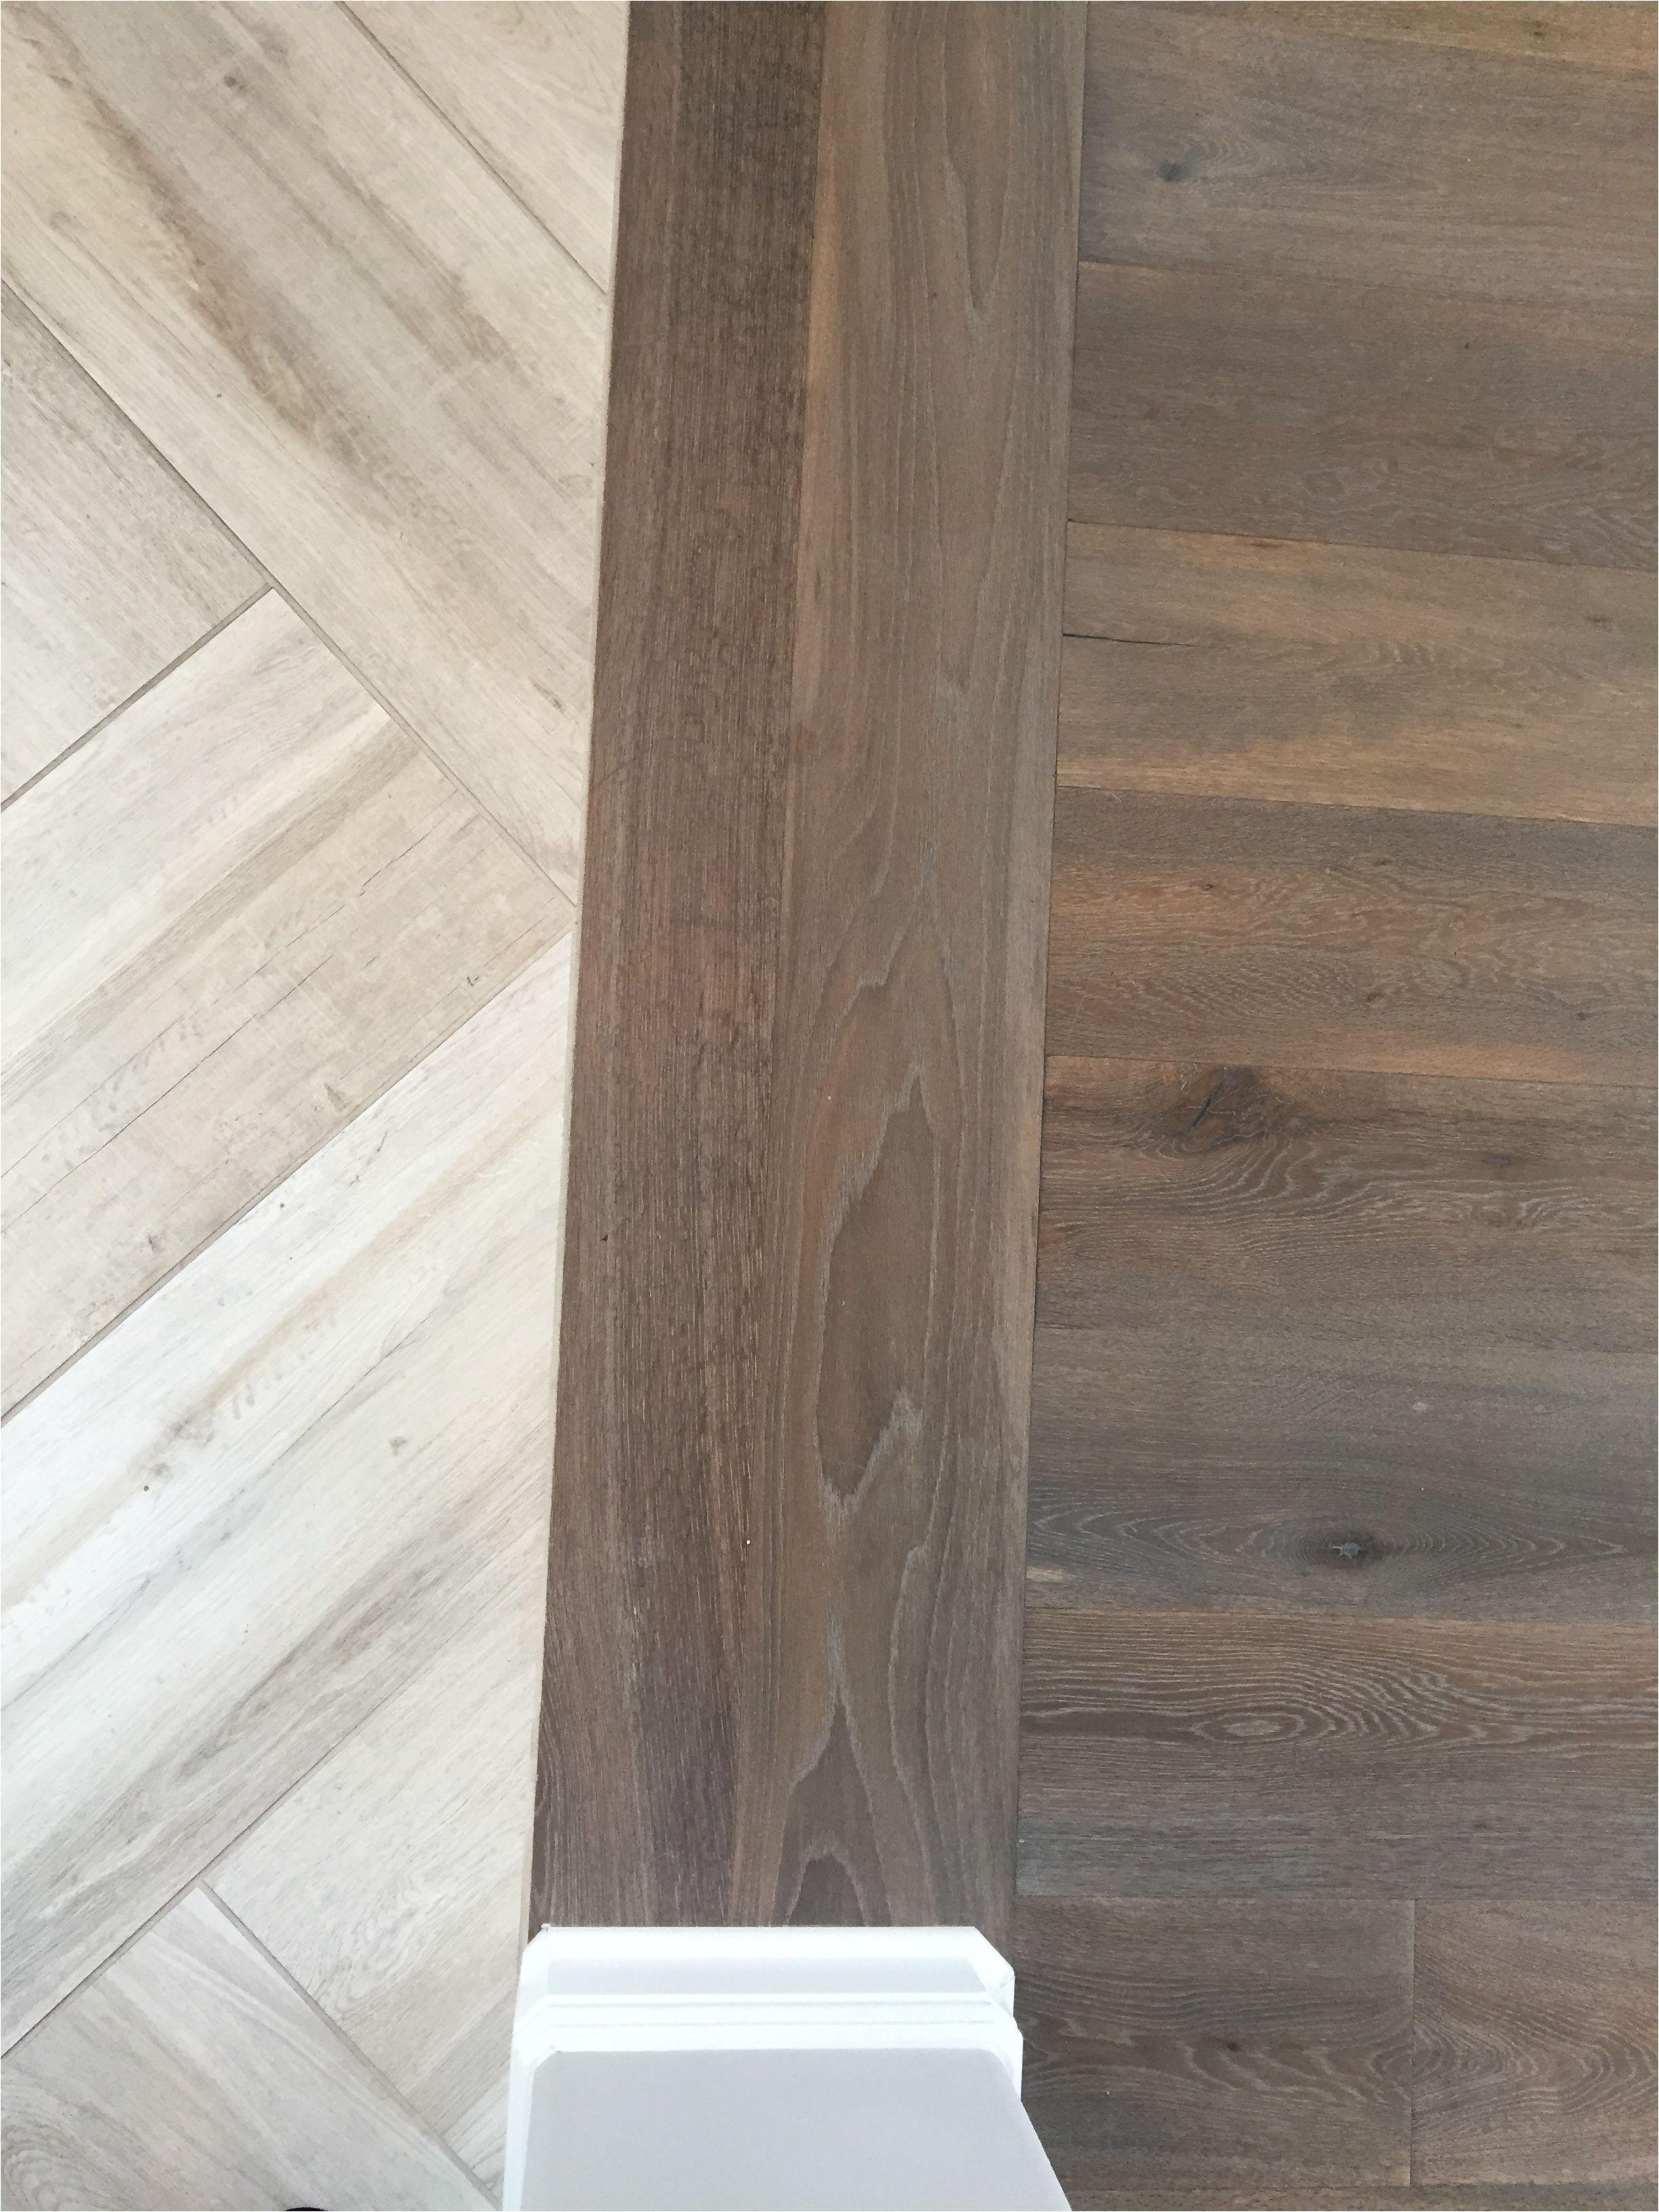 Glue Down Wood Floor Removal Machine Rental Floor Transition